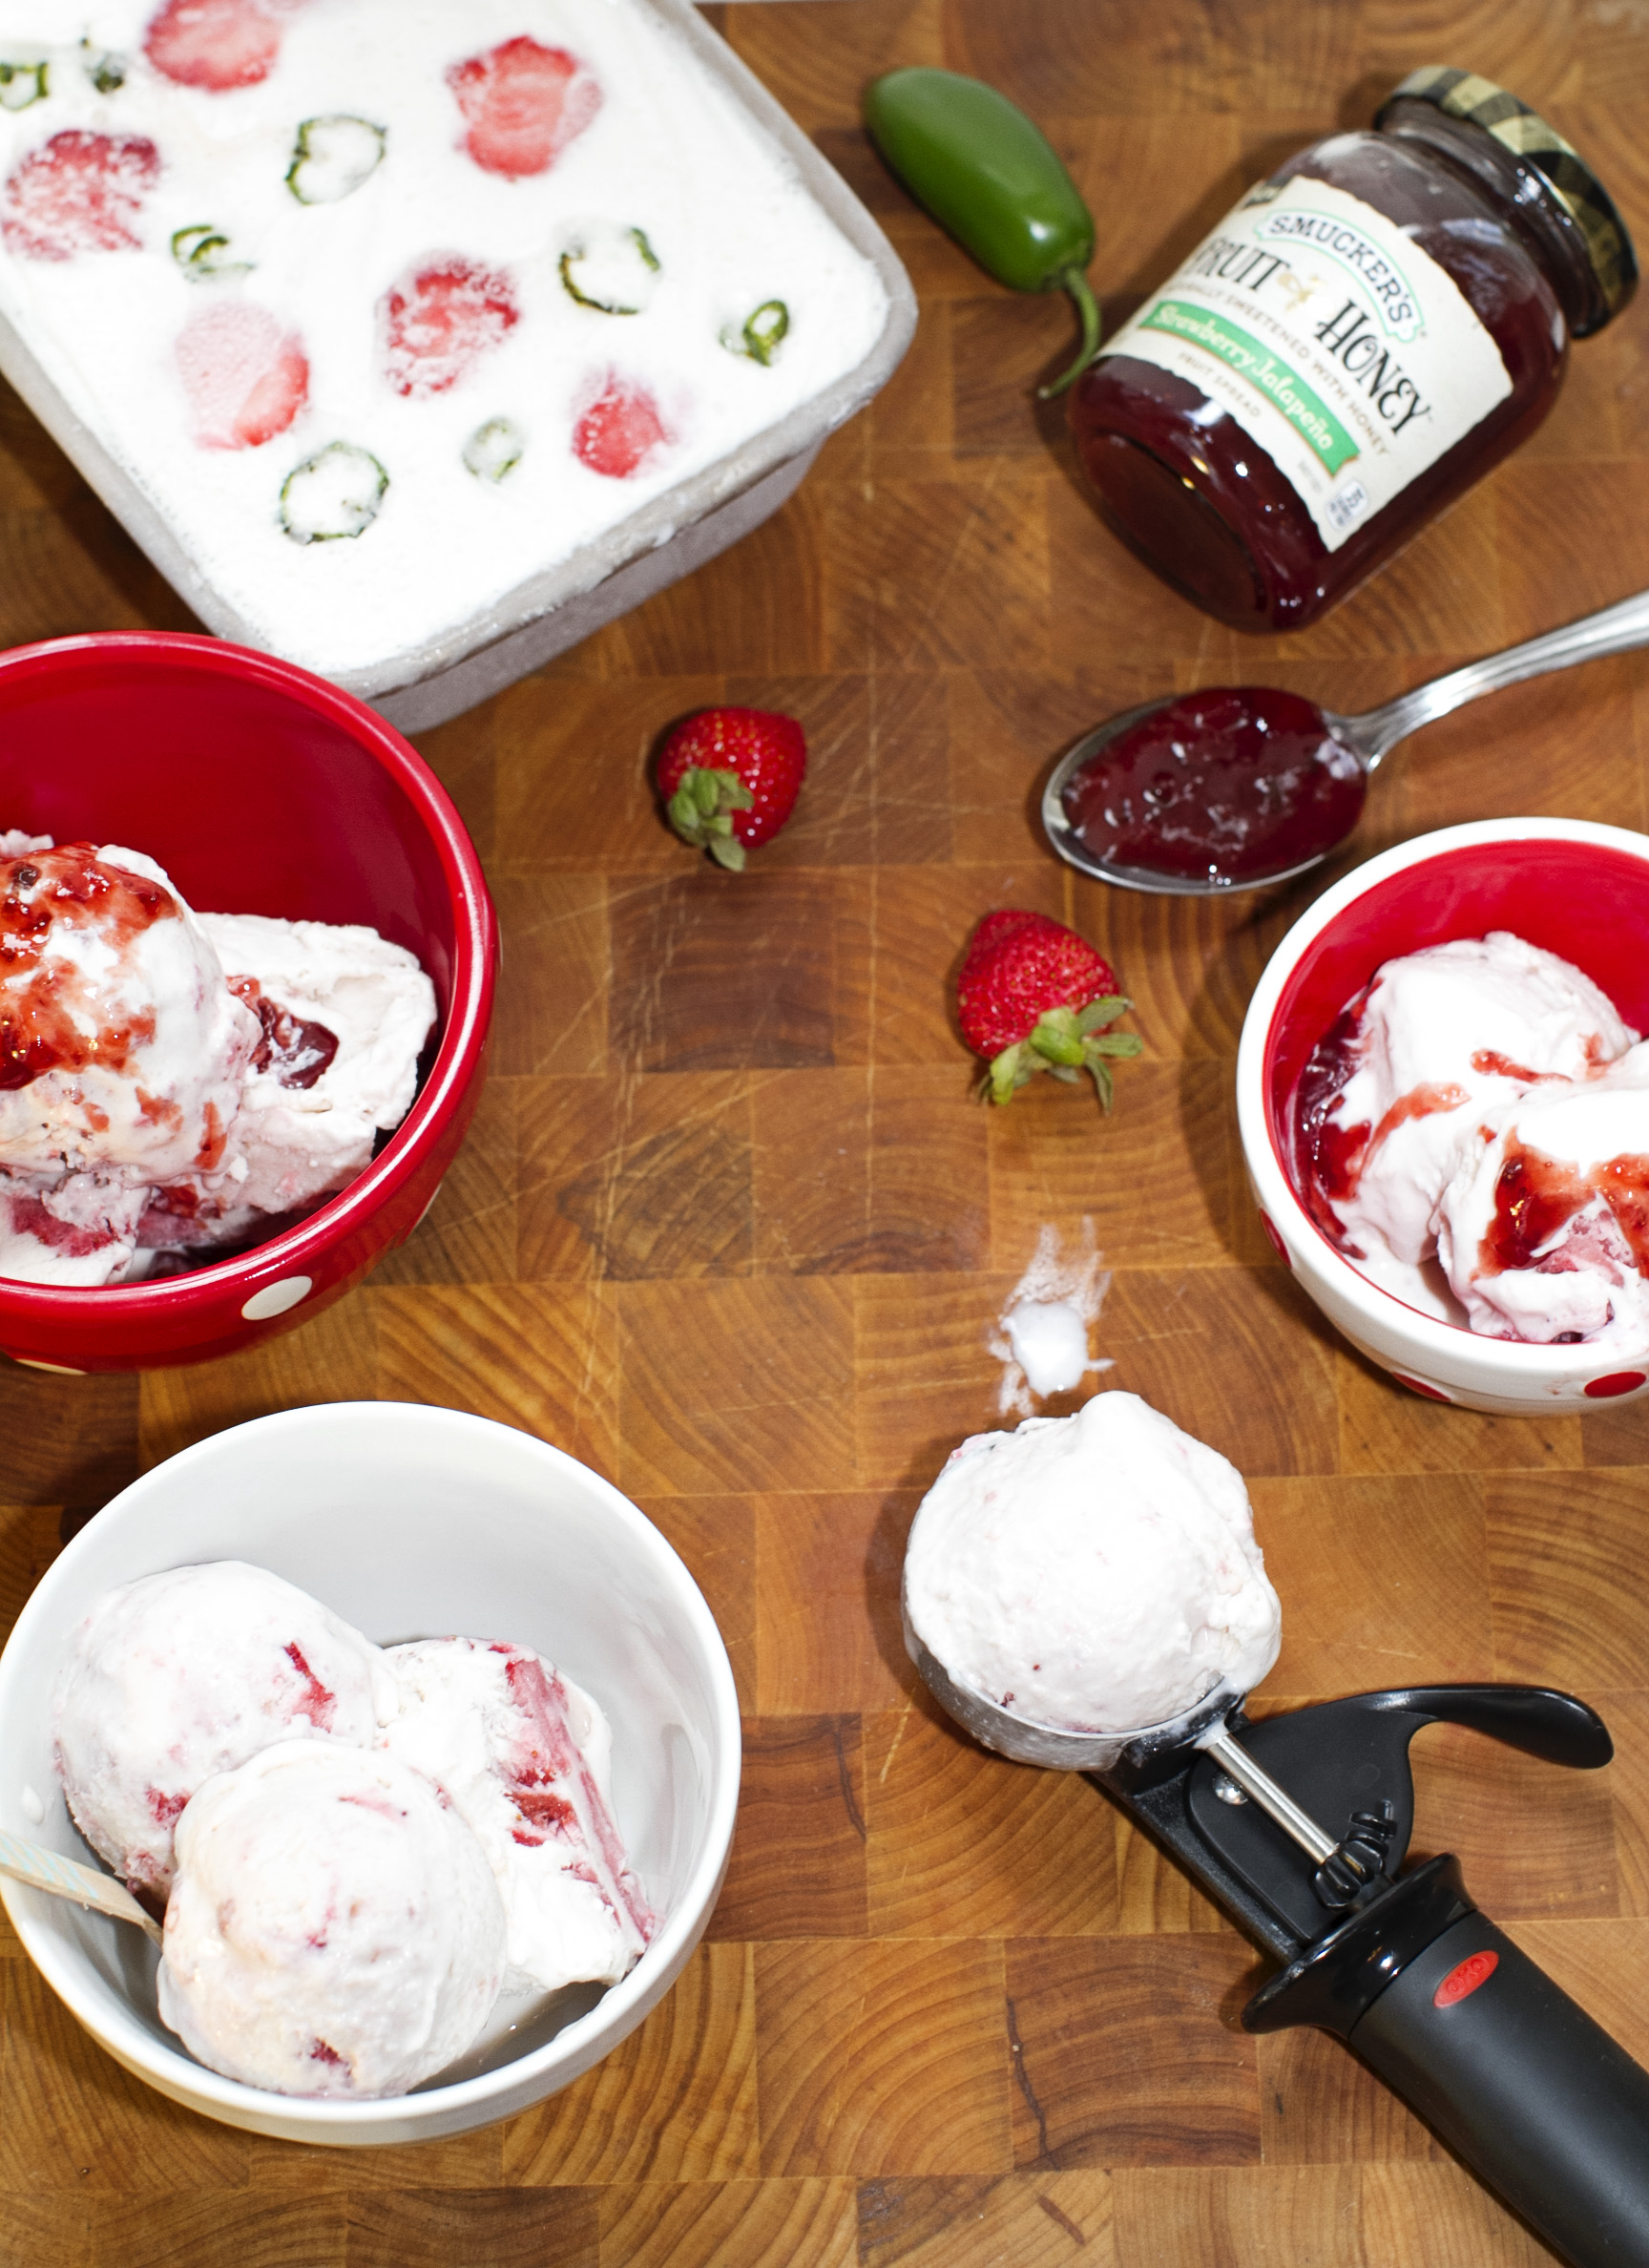 Strawberry Jalapeno No Churn Ice Cream #SpreadTheHeat